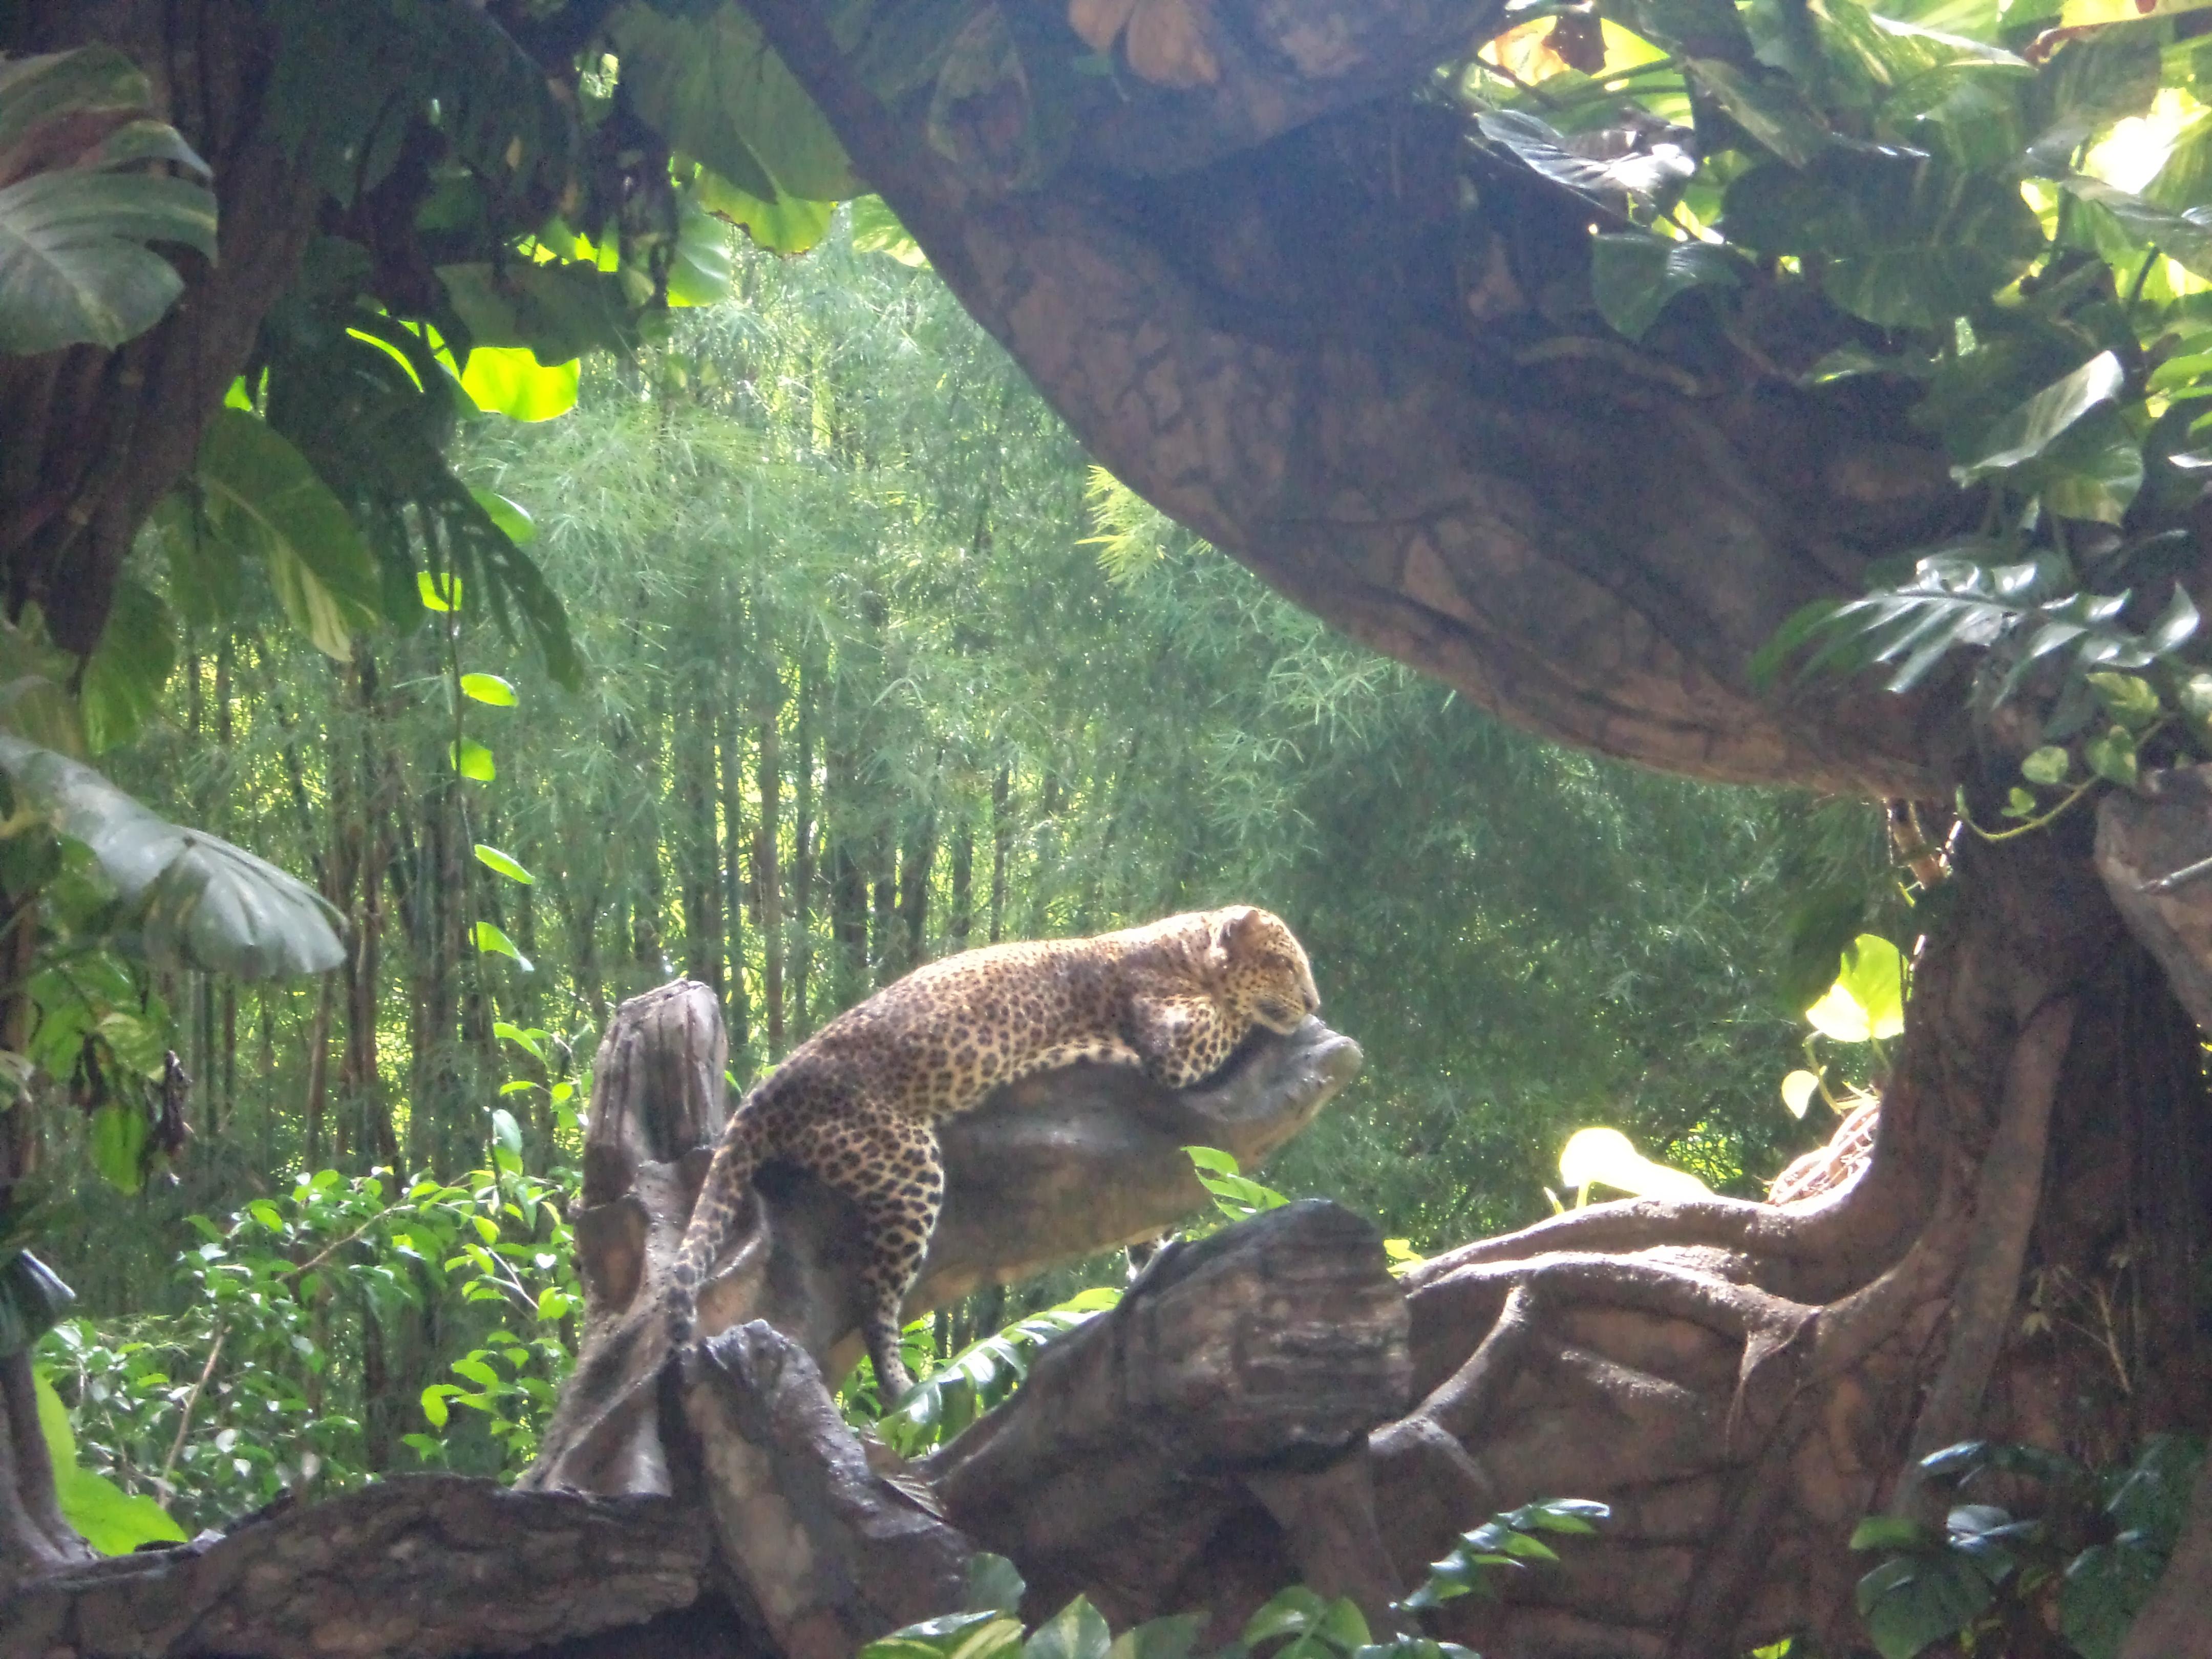 Leopard at Bali Marine and Safari Park